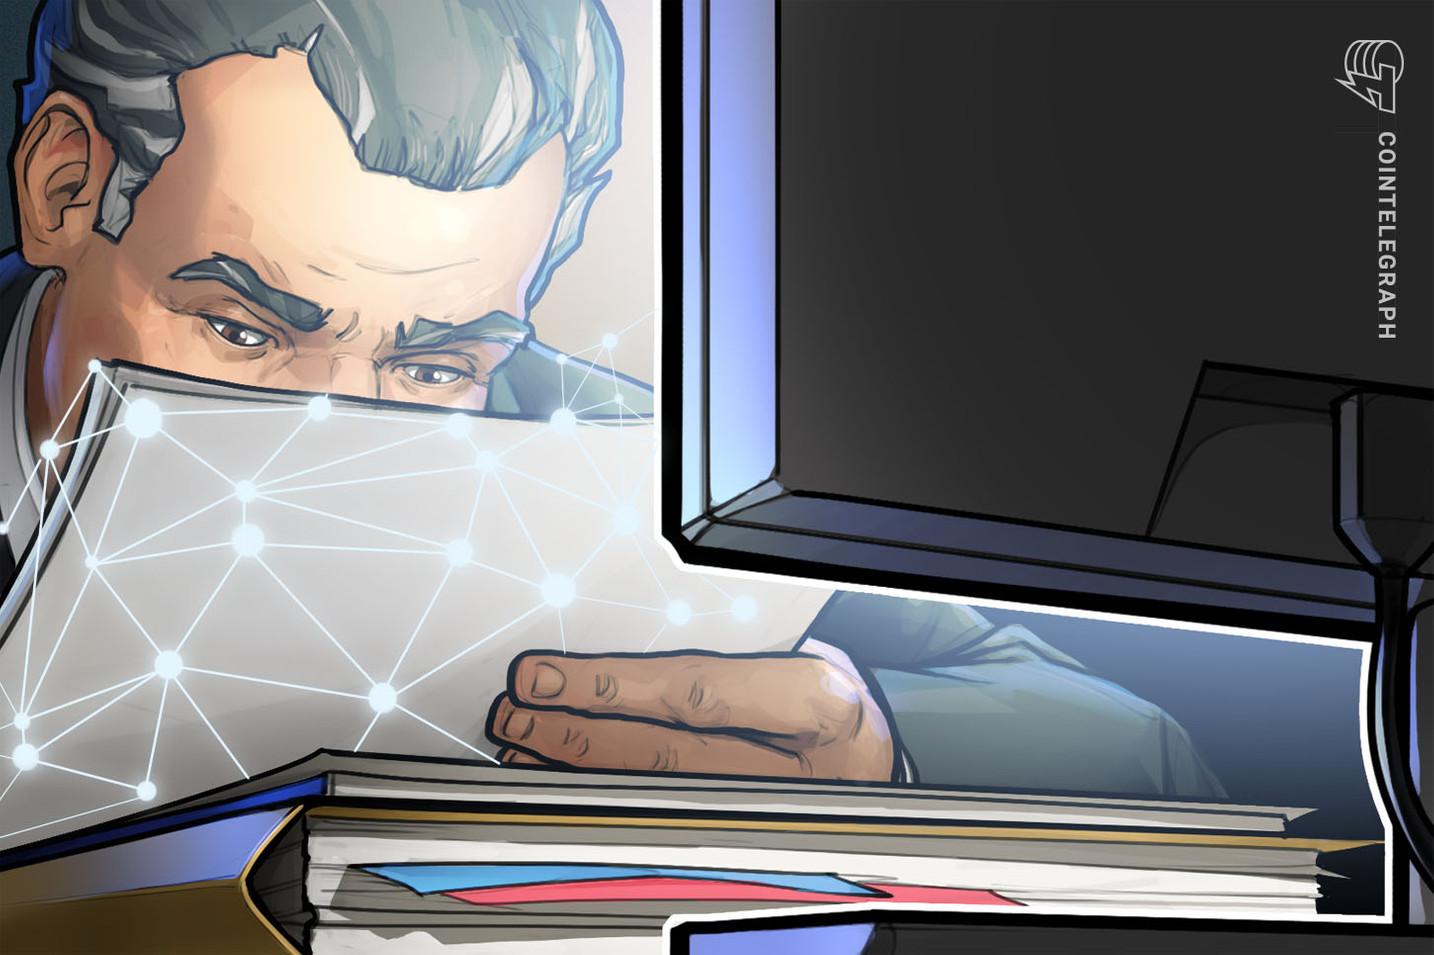 Subsidiaria de la Societe Generale emite un bono de 100 millones de euros en la cadena de bloques de Ethereum